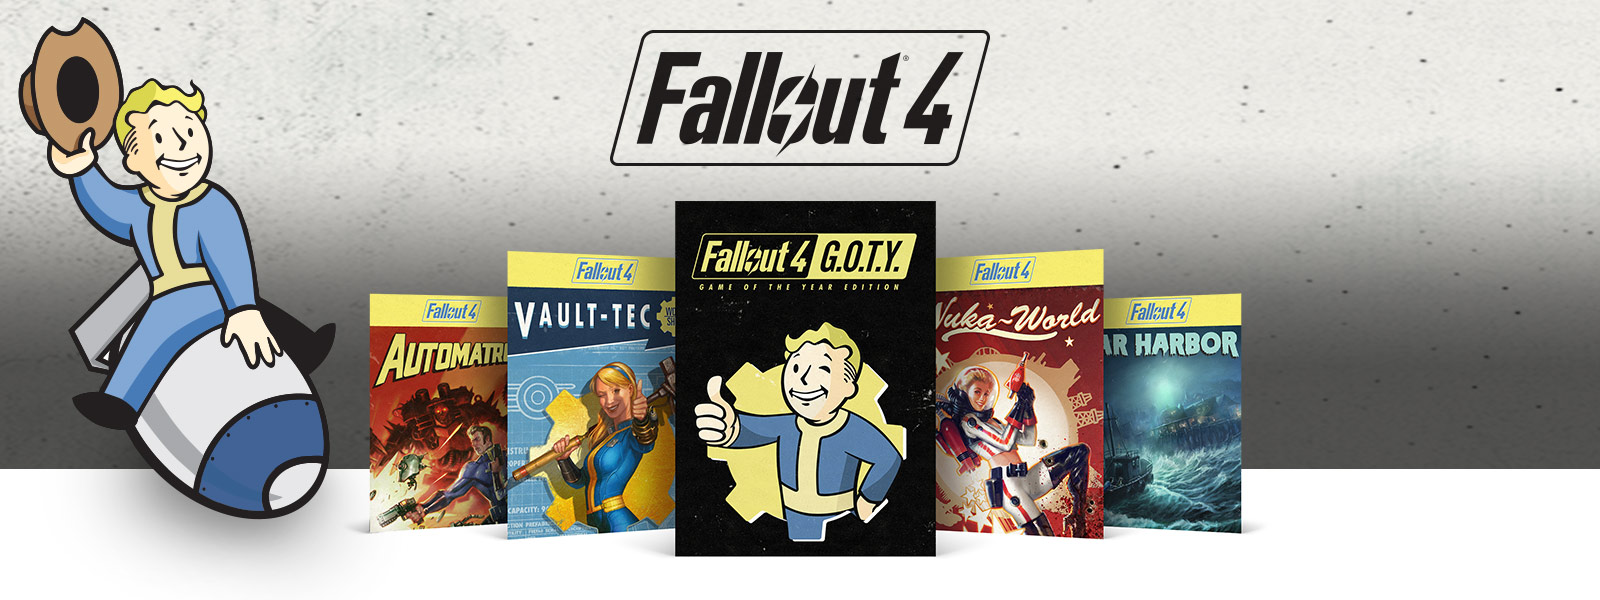 Fallout 4 Sale